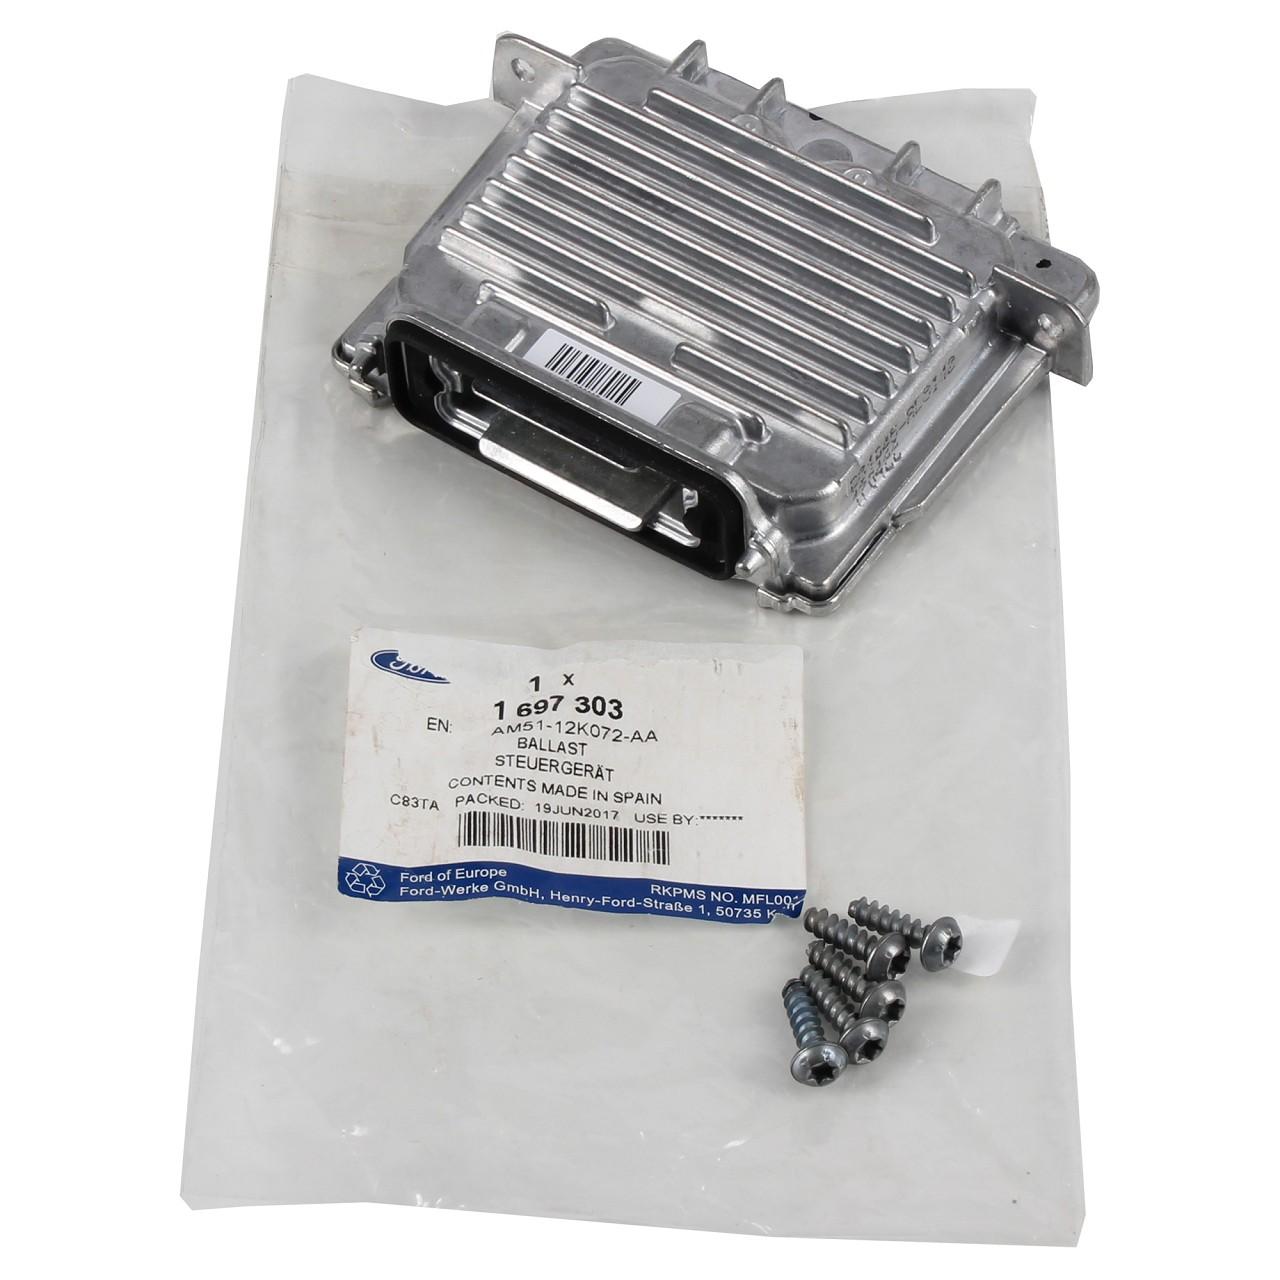 ORIGINAL Ford Steuergerät Xenon Vorschaltgerät GRAND / C-MAX II KUGA II 1697303